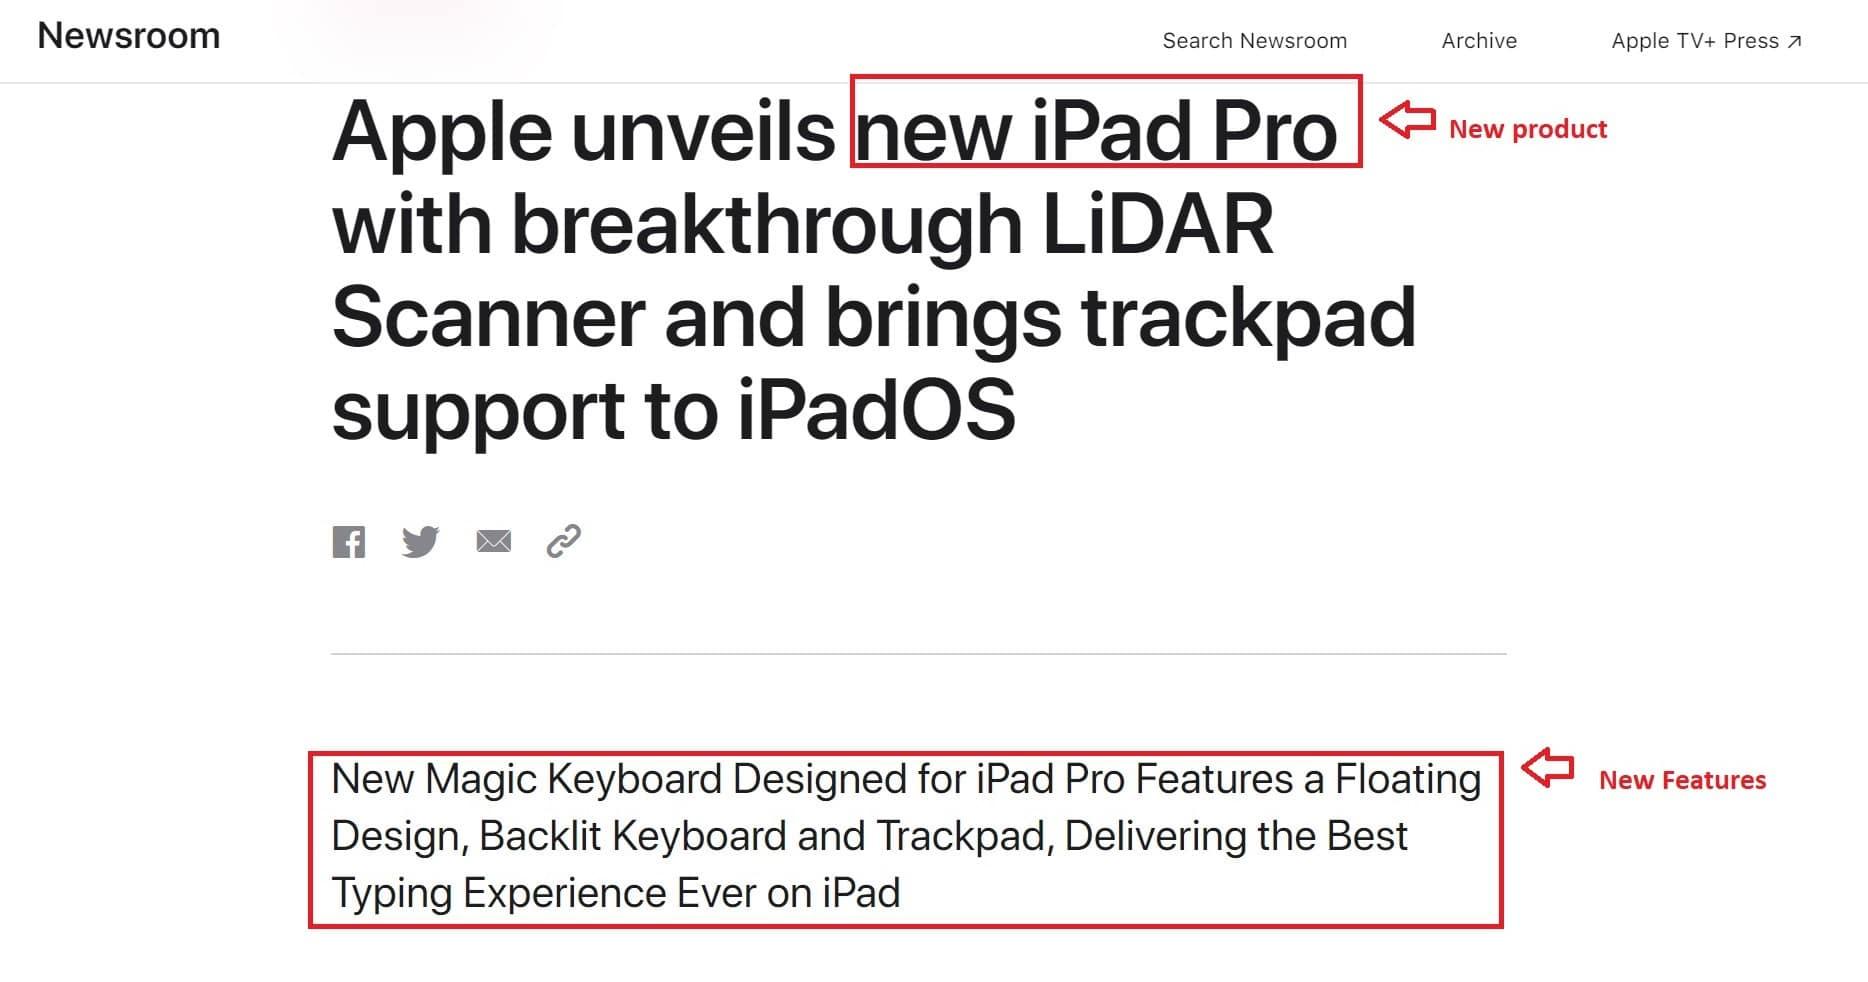 Apple press release example